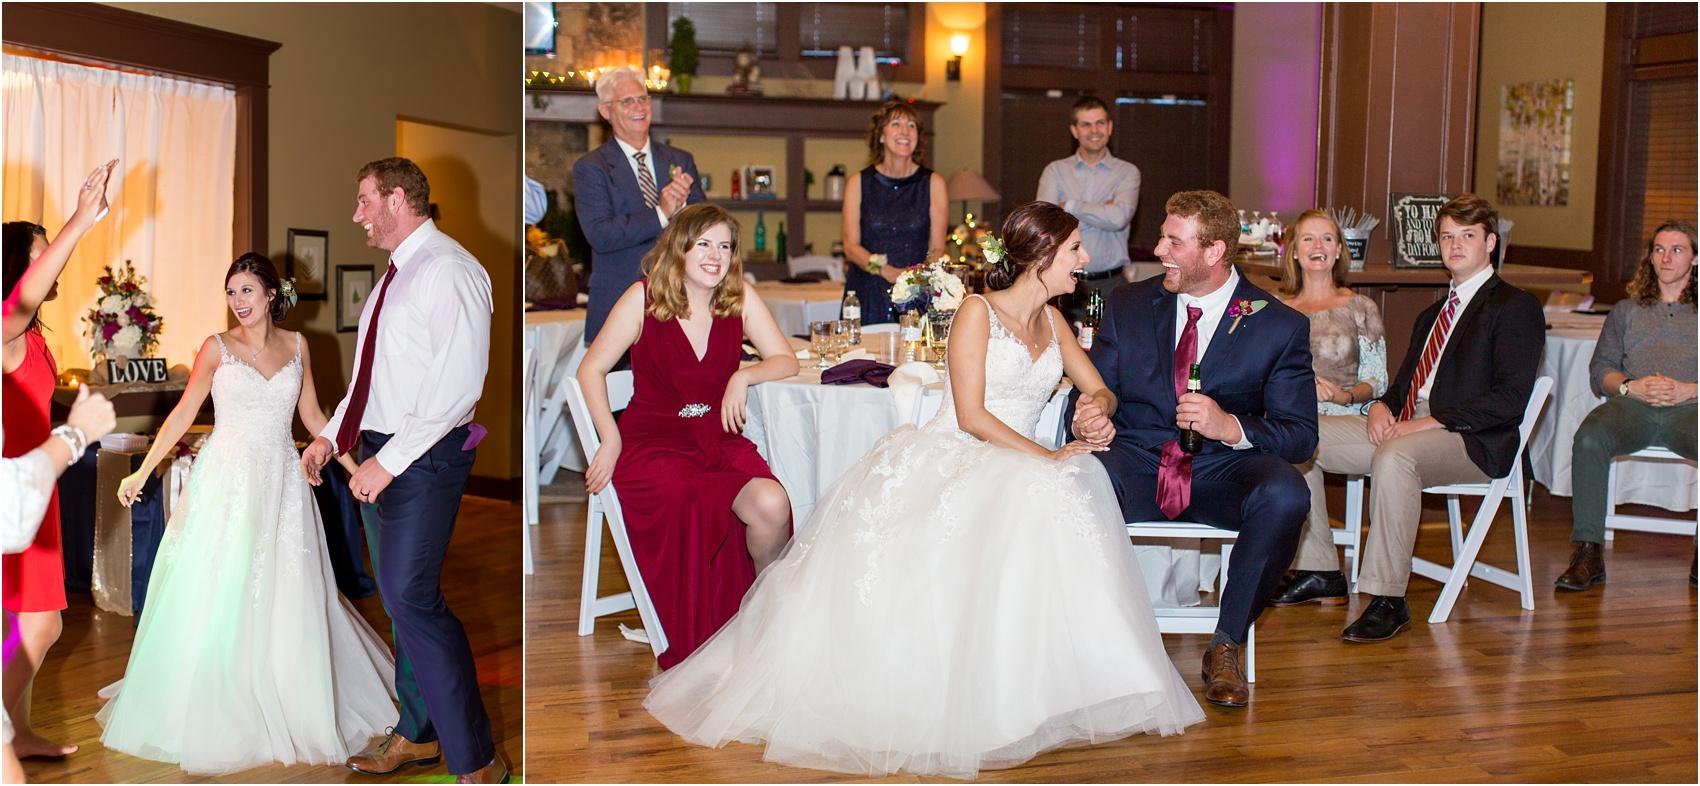 Savannah Eve Photography- May Wedding- Blog-50.jpg